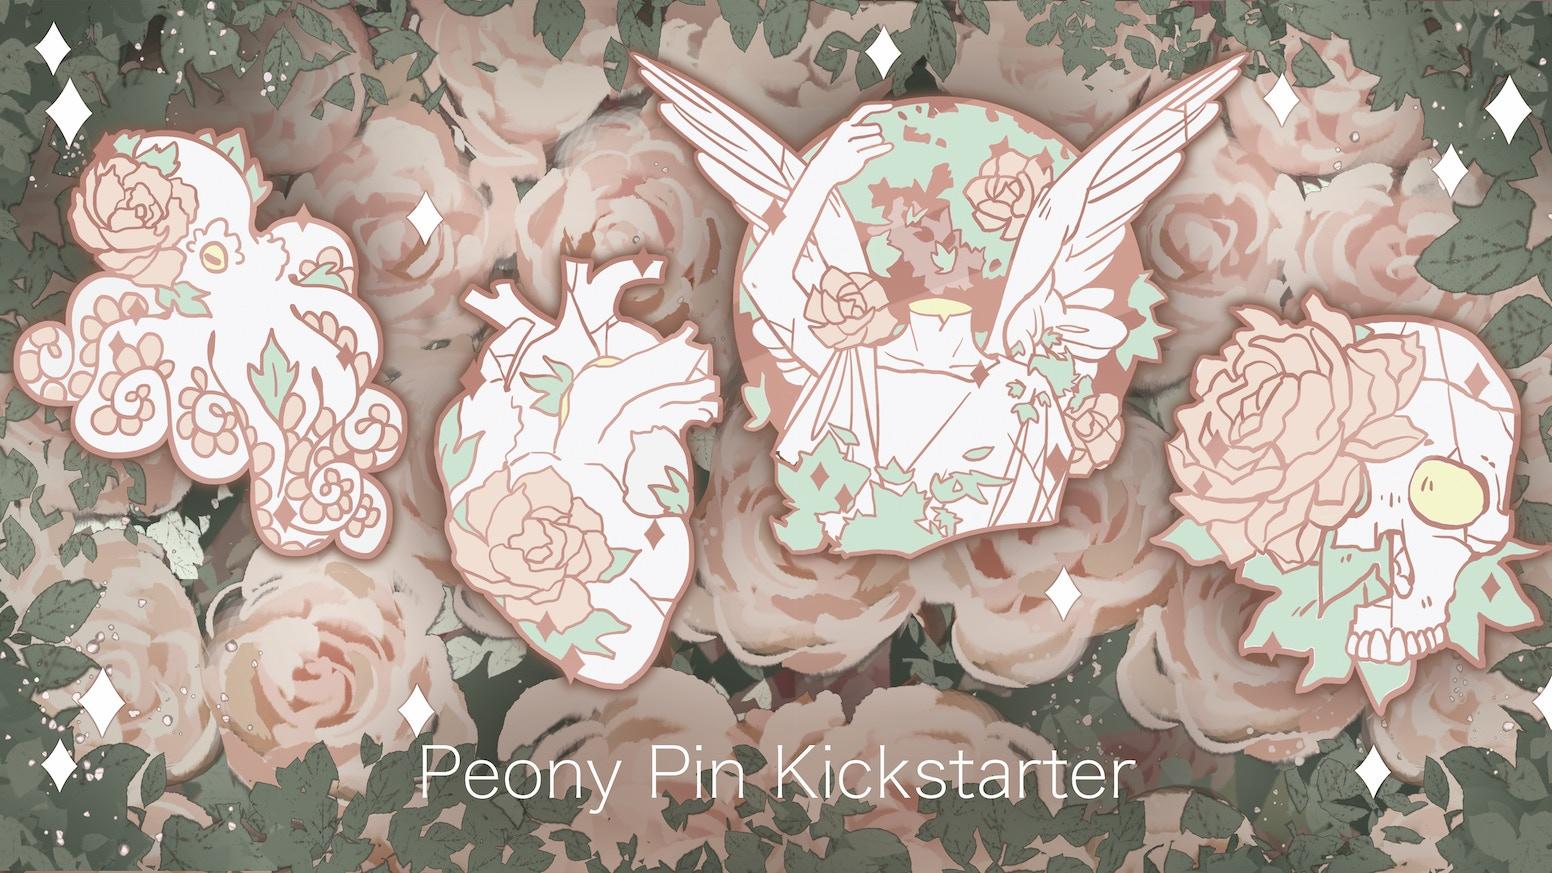 a0319c3de30 Peony Enamel Pins by Paige McIntosh — Kickstarter